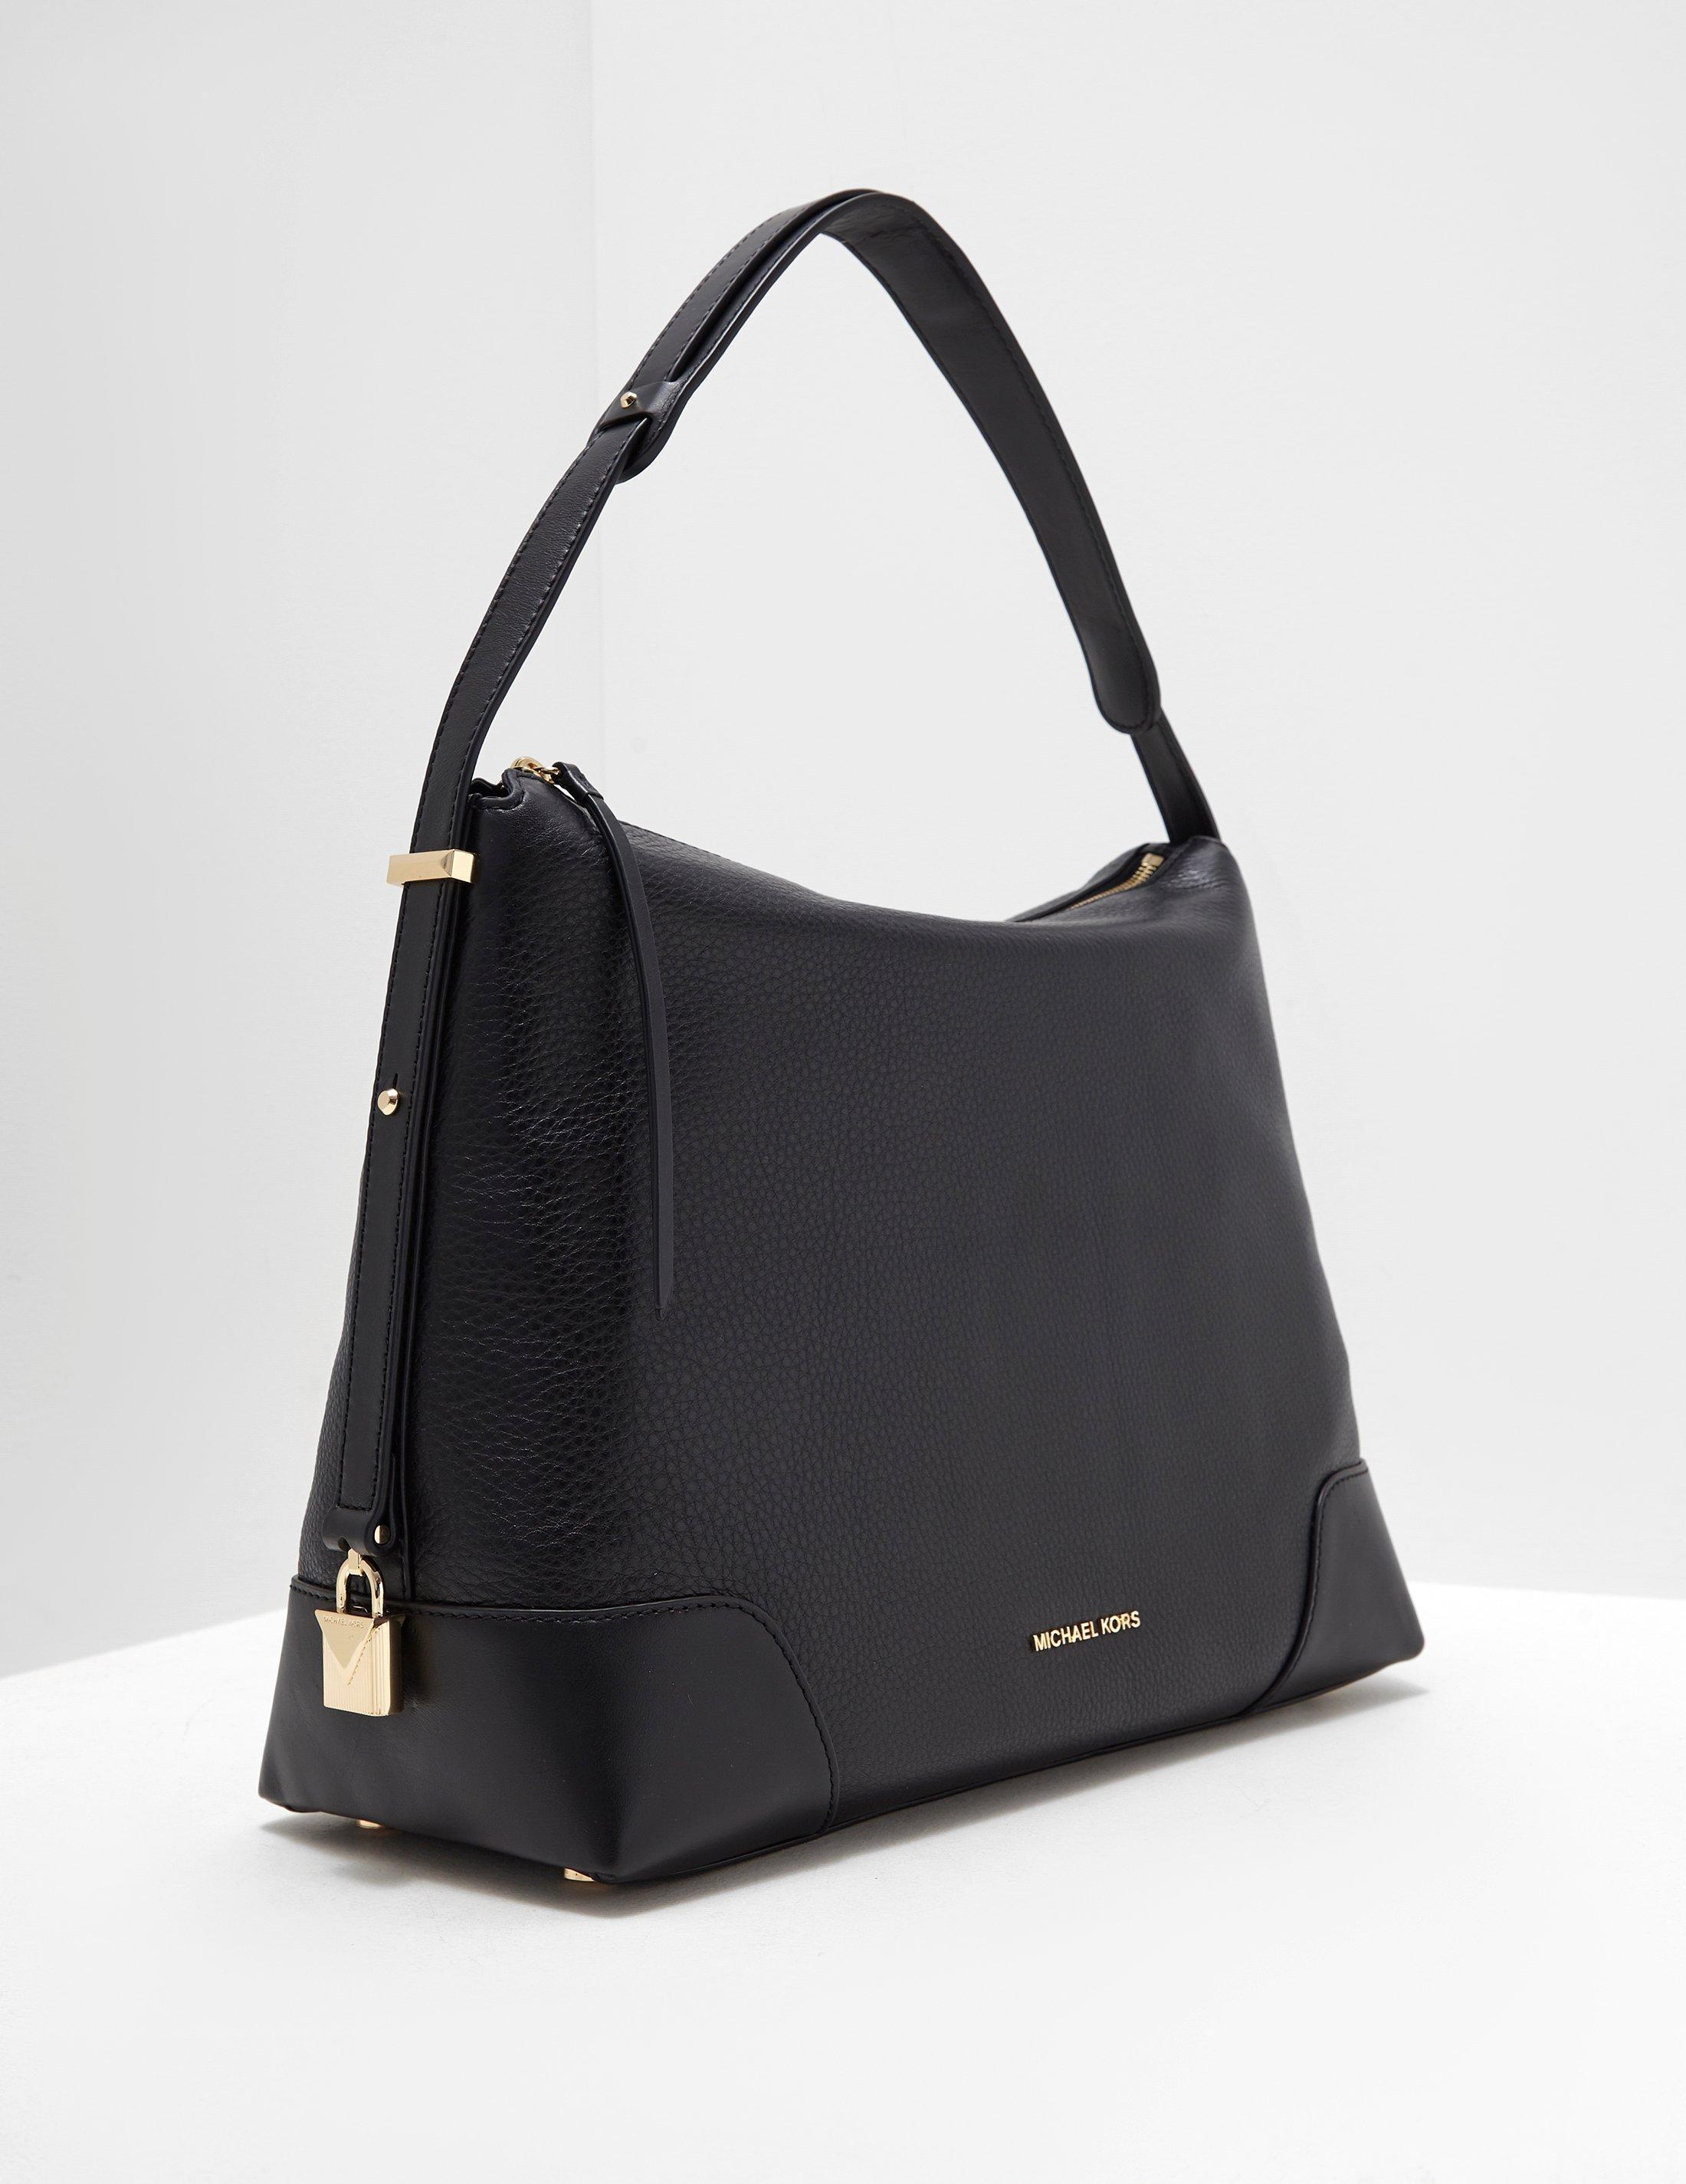 b967bbae7e1b47 Lyst - Michael Kors Womens Large Leather Shoulder Bag Black in Black